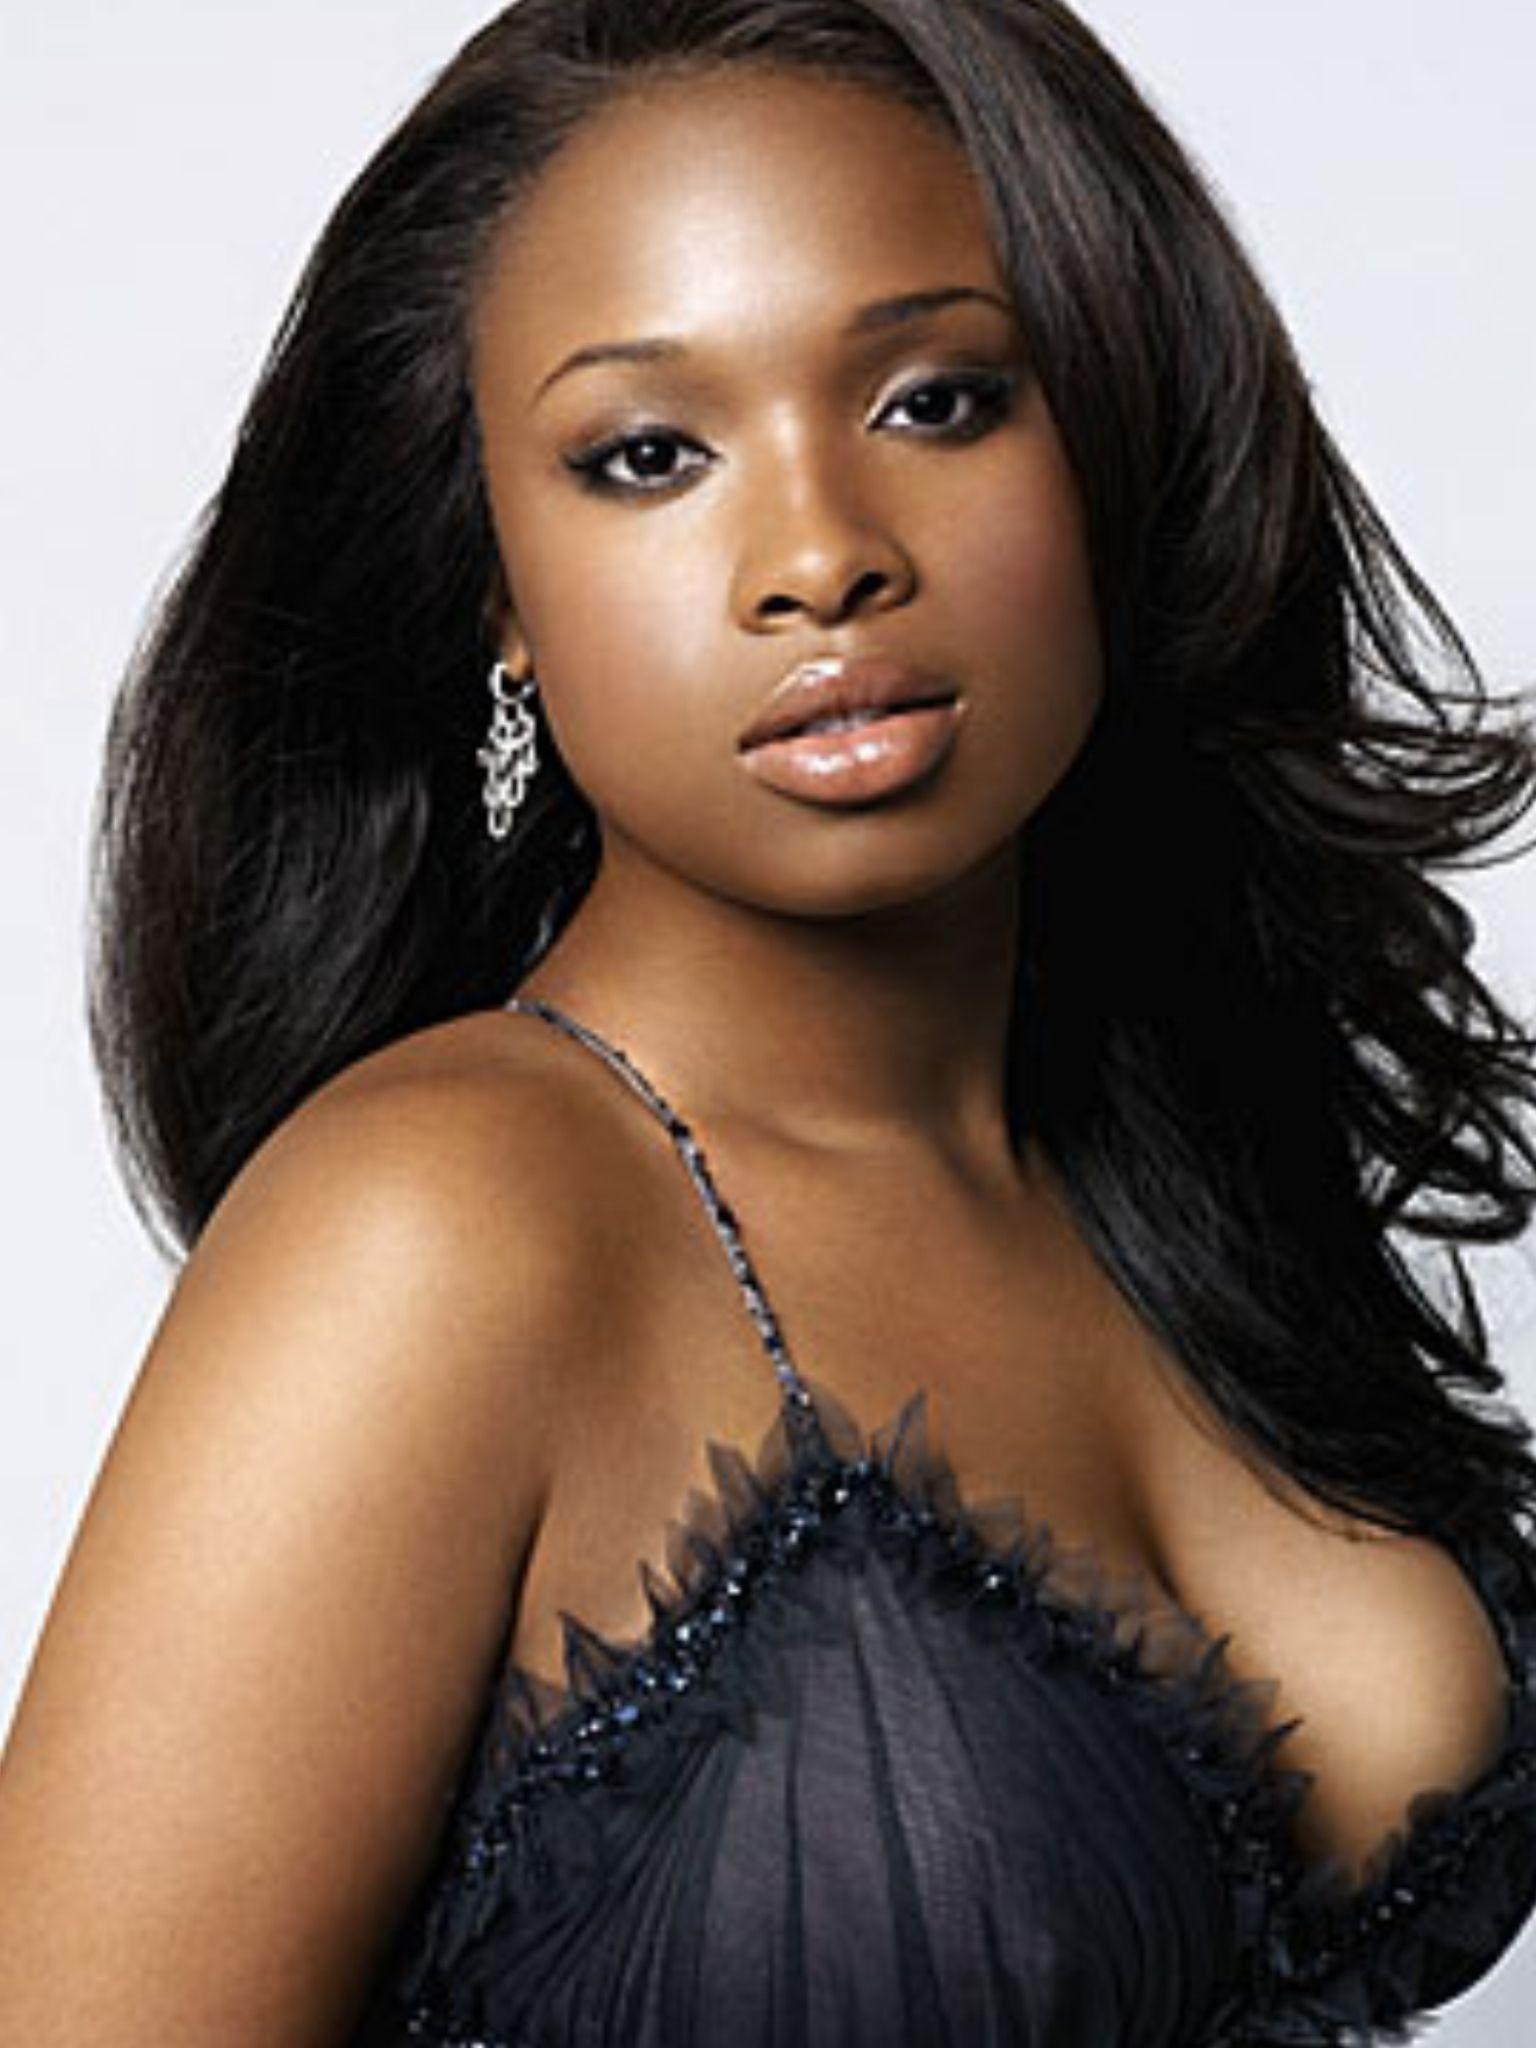 image Anita jacob from nigeria